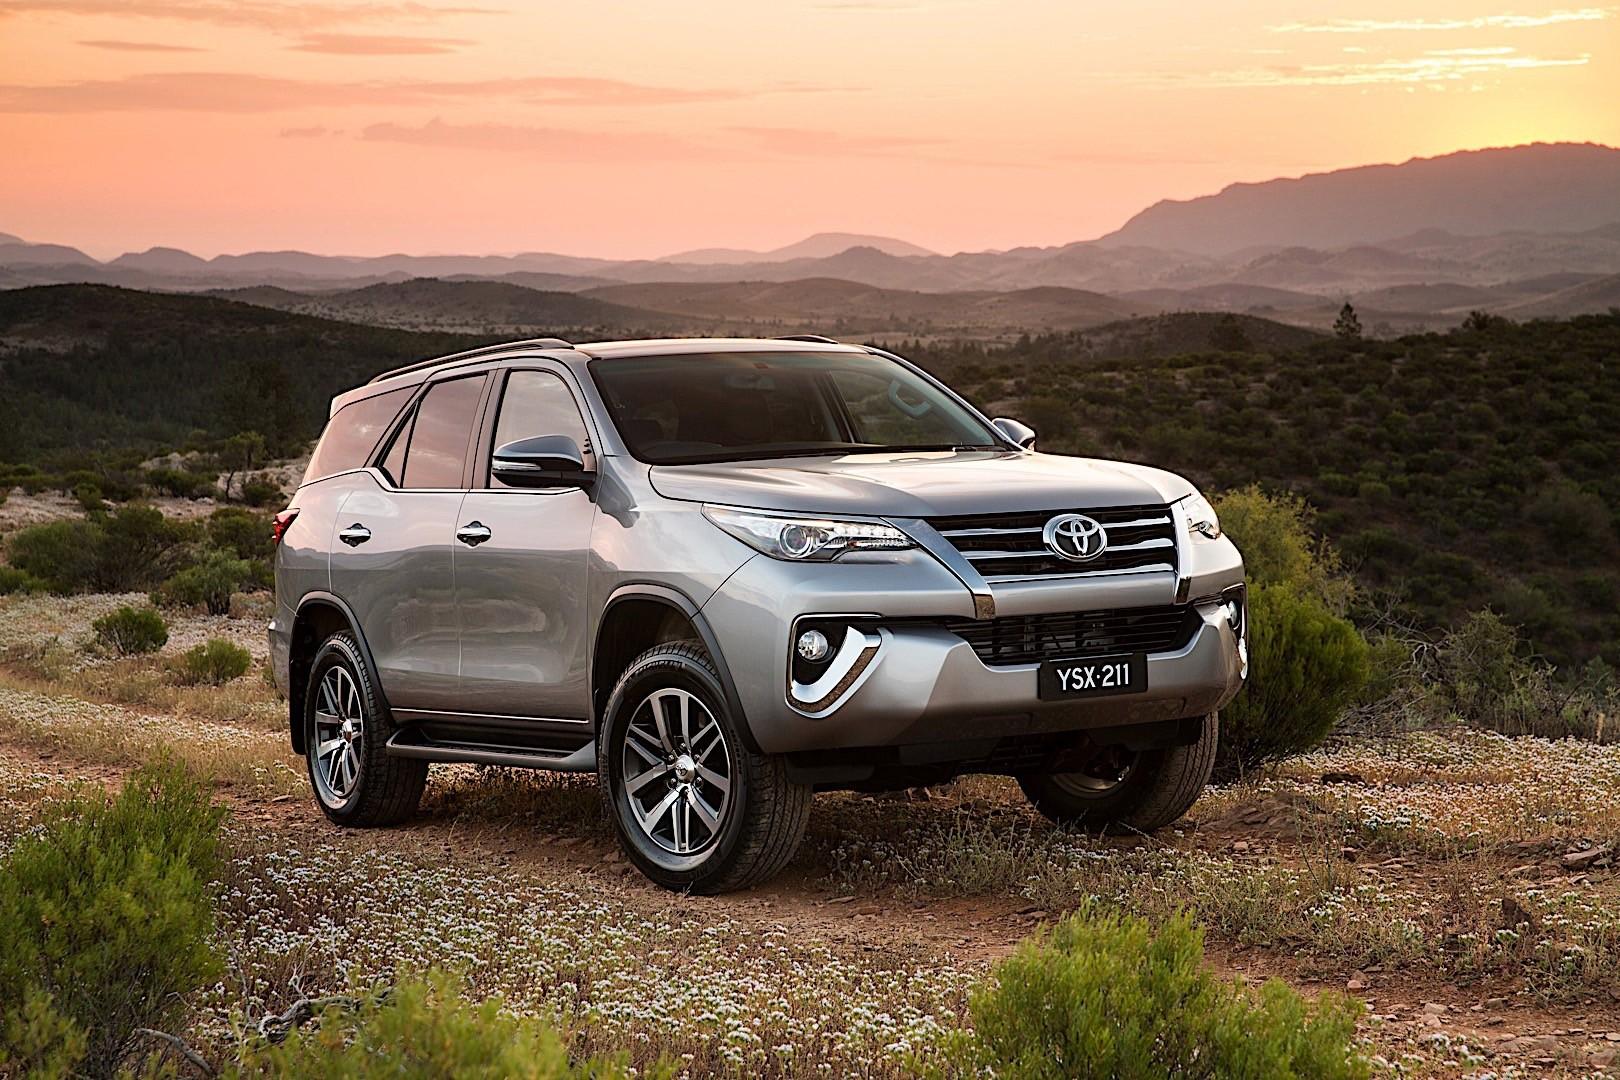 Toyota Land Cruiser Hd Wallpaper Toyota Fortuner Specs Amp Photos 2015 2016 2017 2018